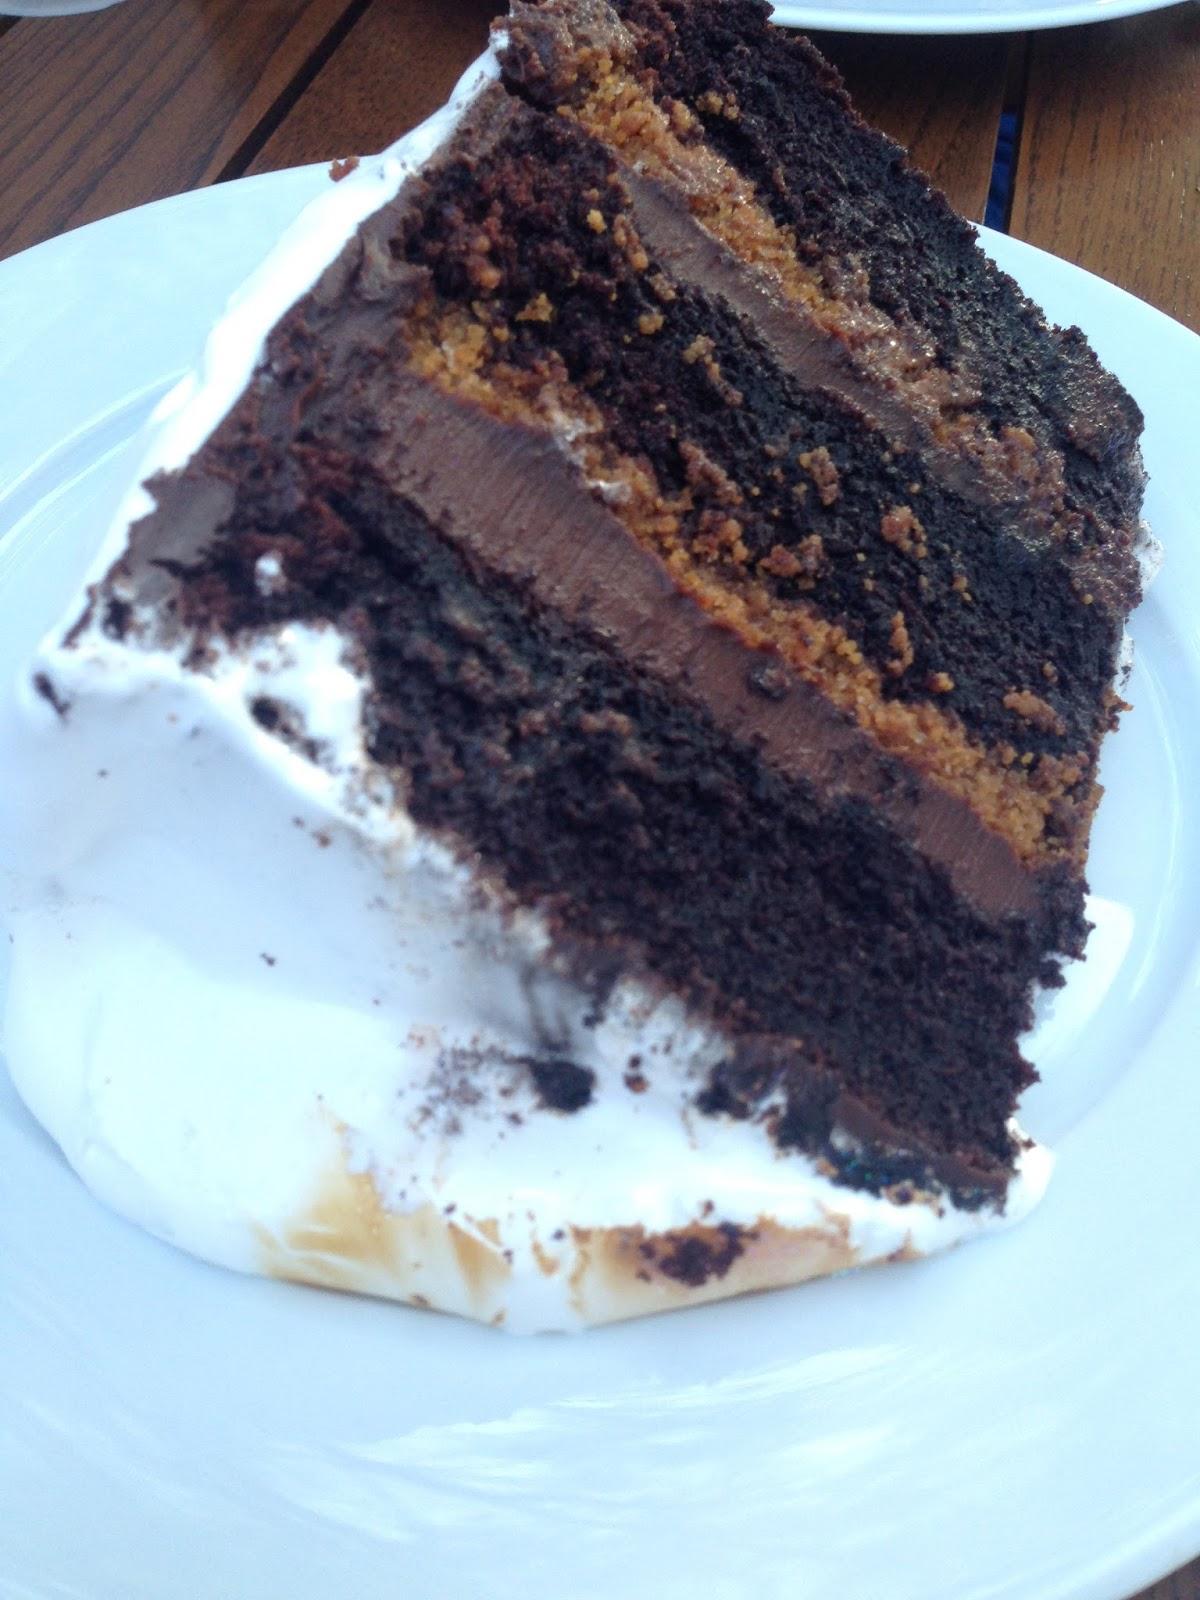 Indianapolis Restaurant Scene: The Cake Bake Shop